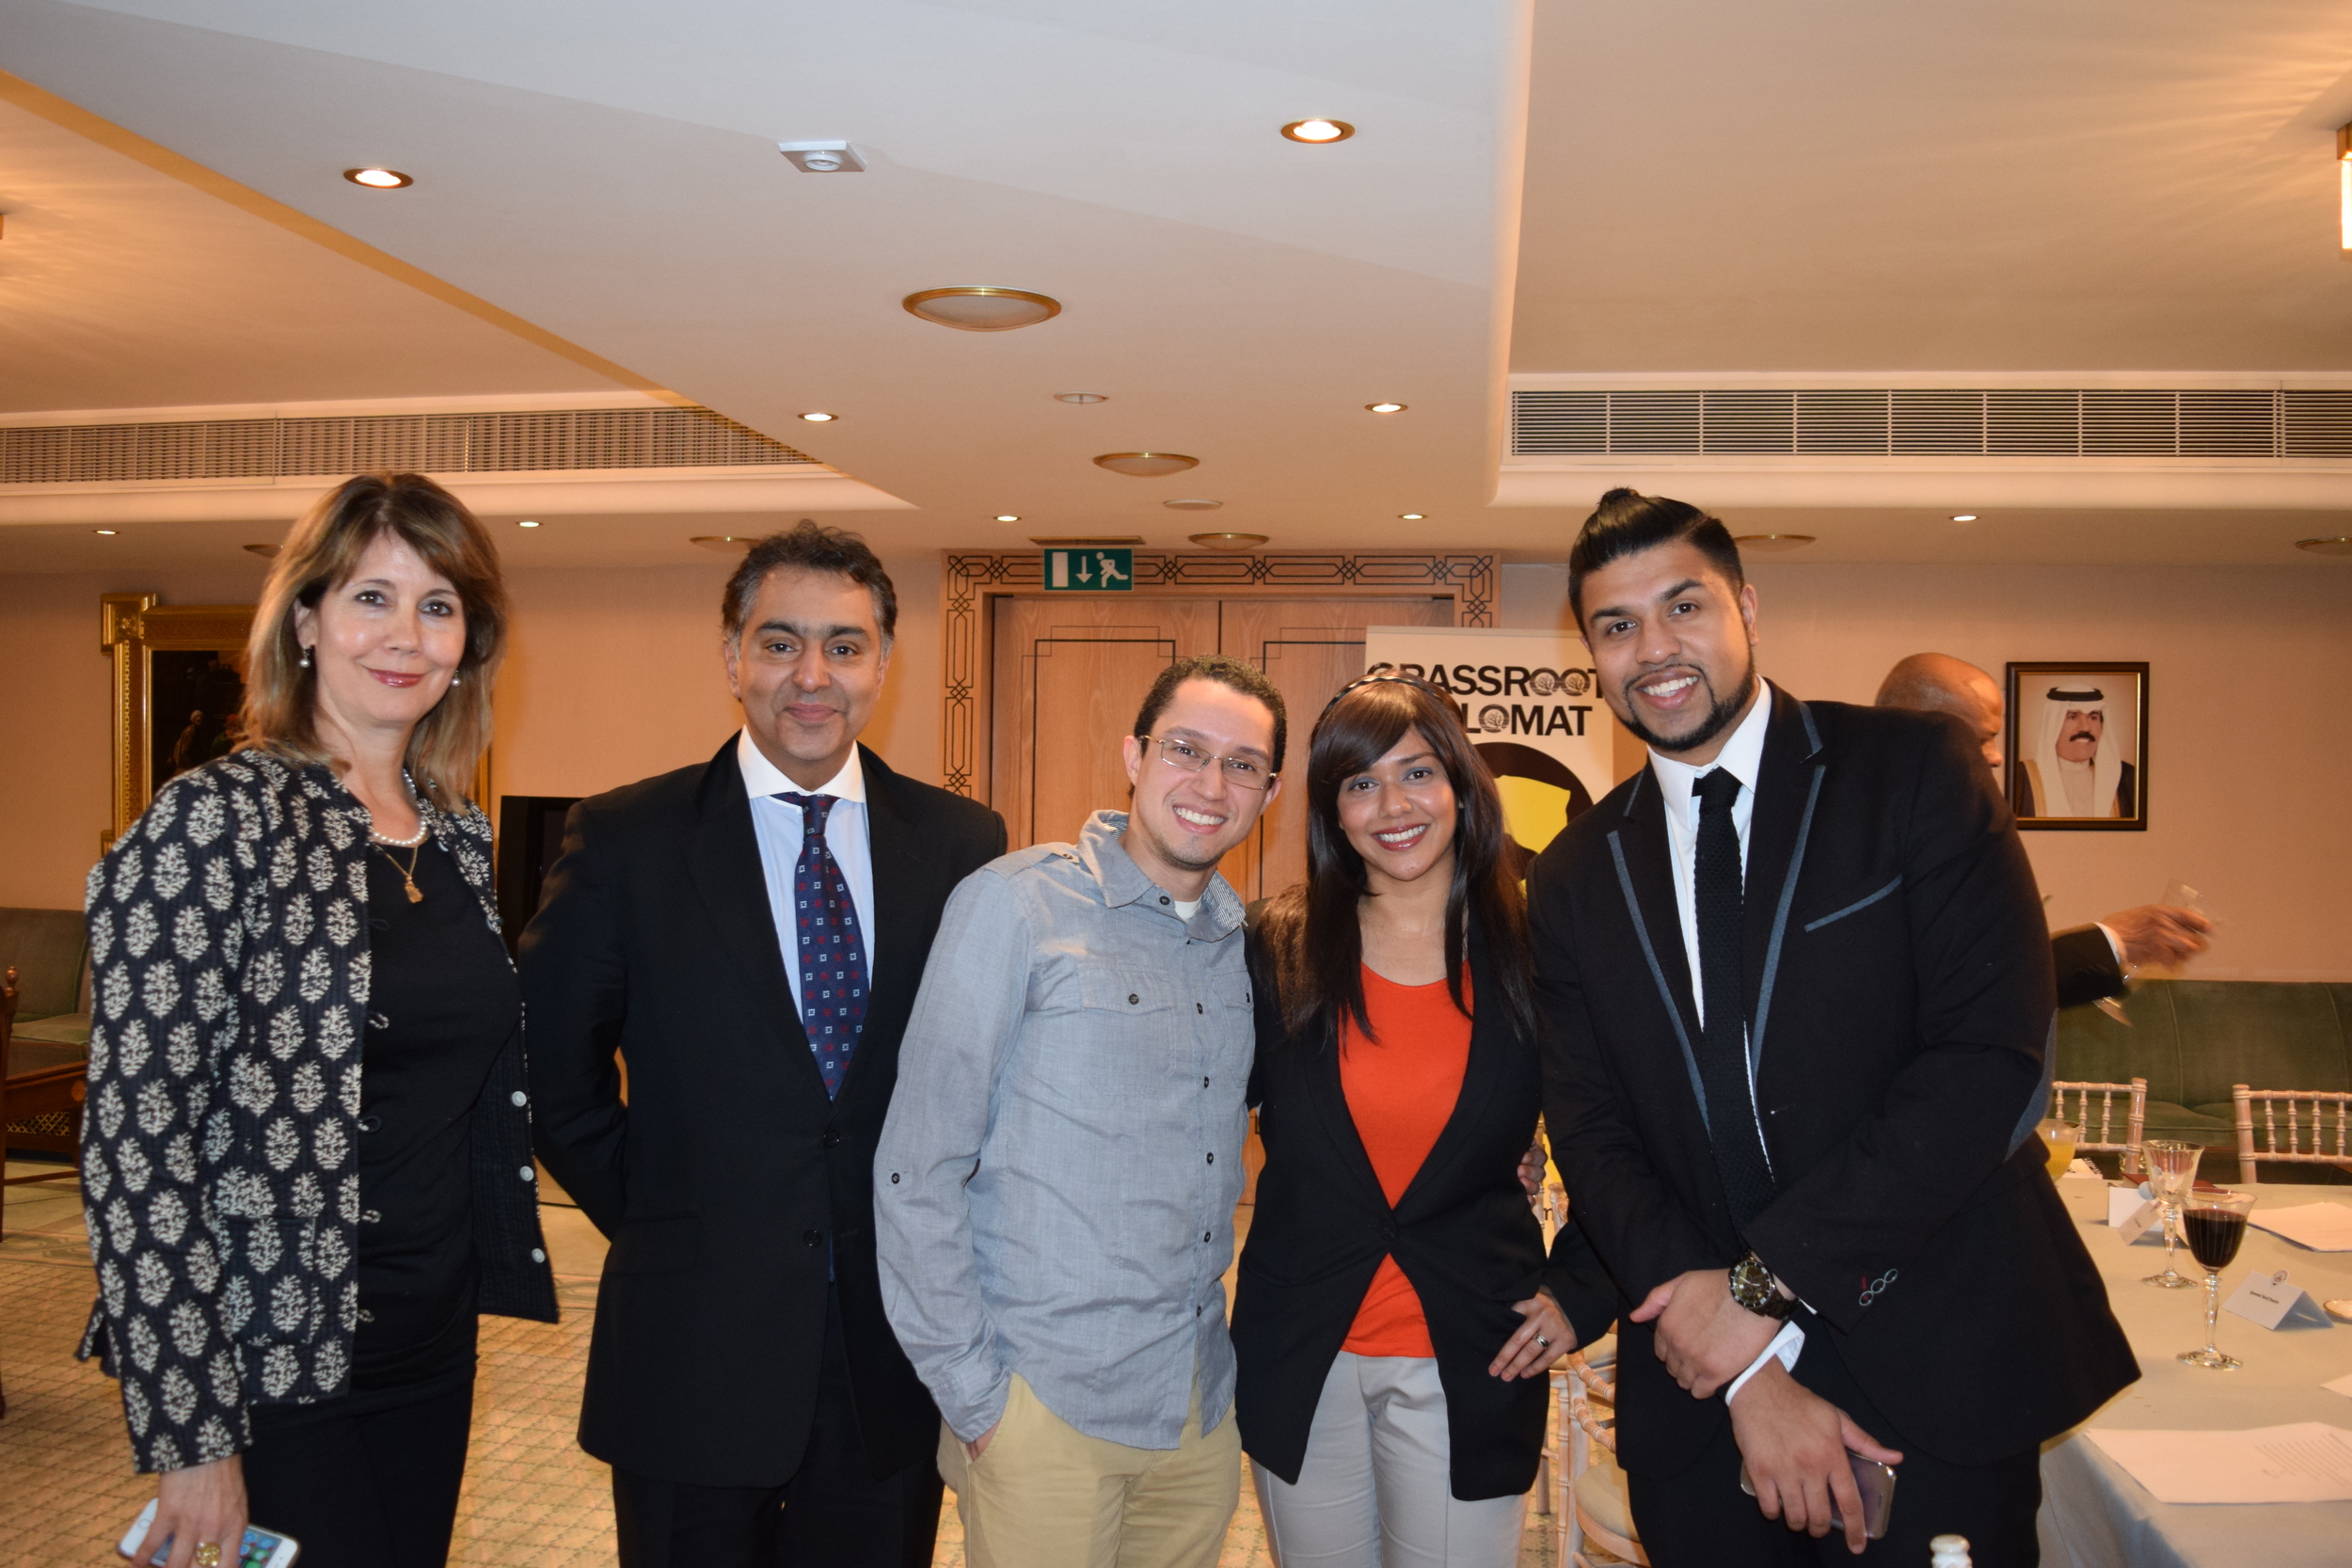 Kristiane Backer, Haras Rafiq, Anthony Figueroa, Talyn Rahman-Figueroa and Humza Arshad